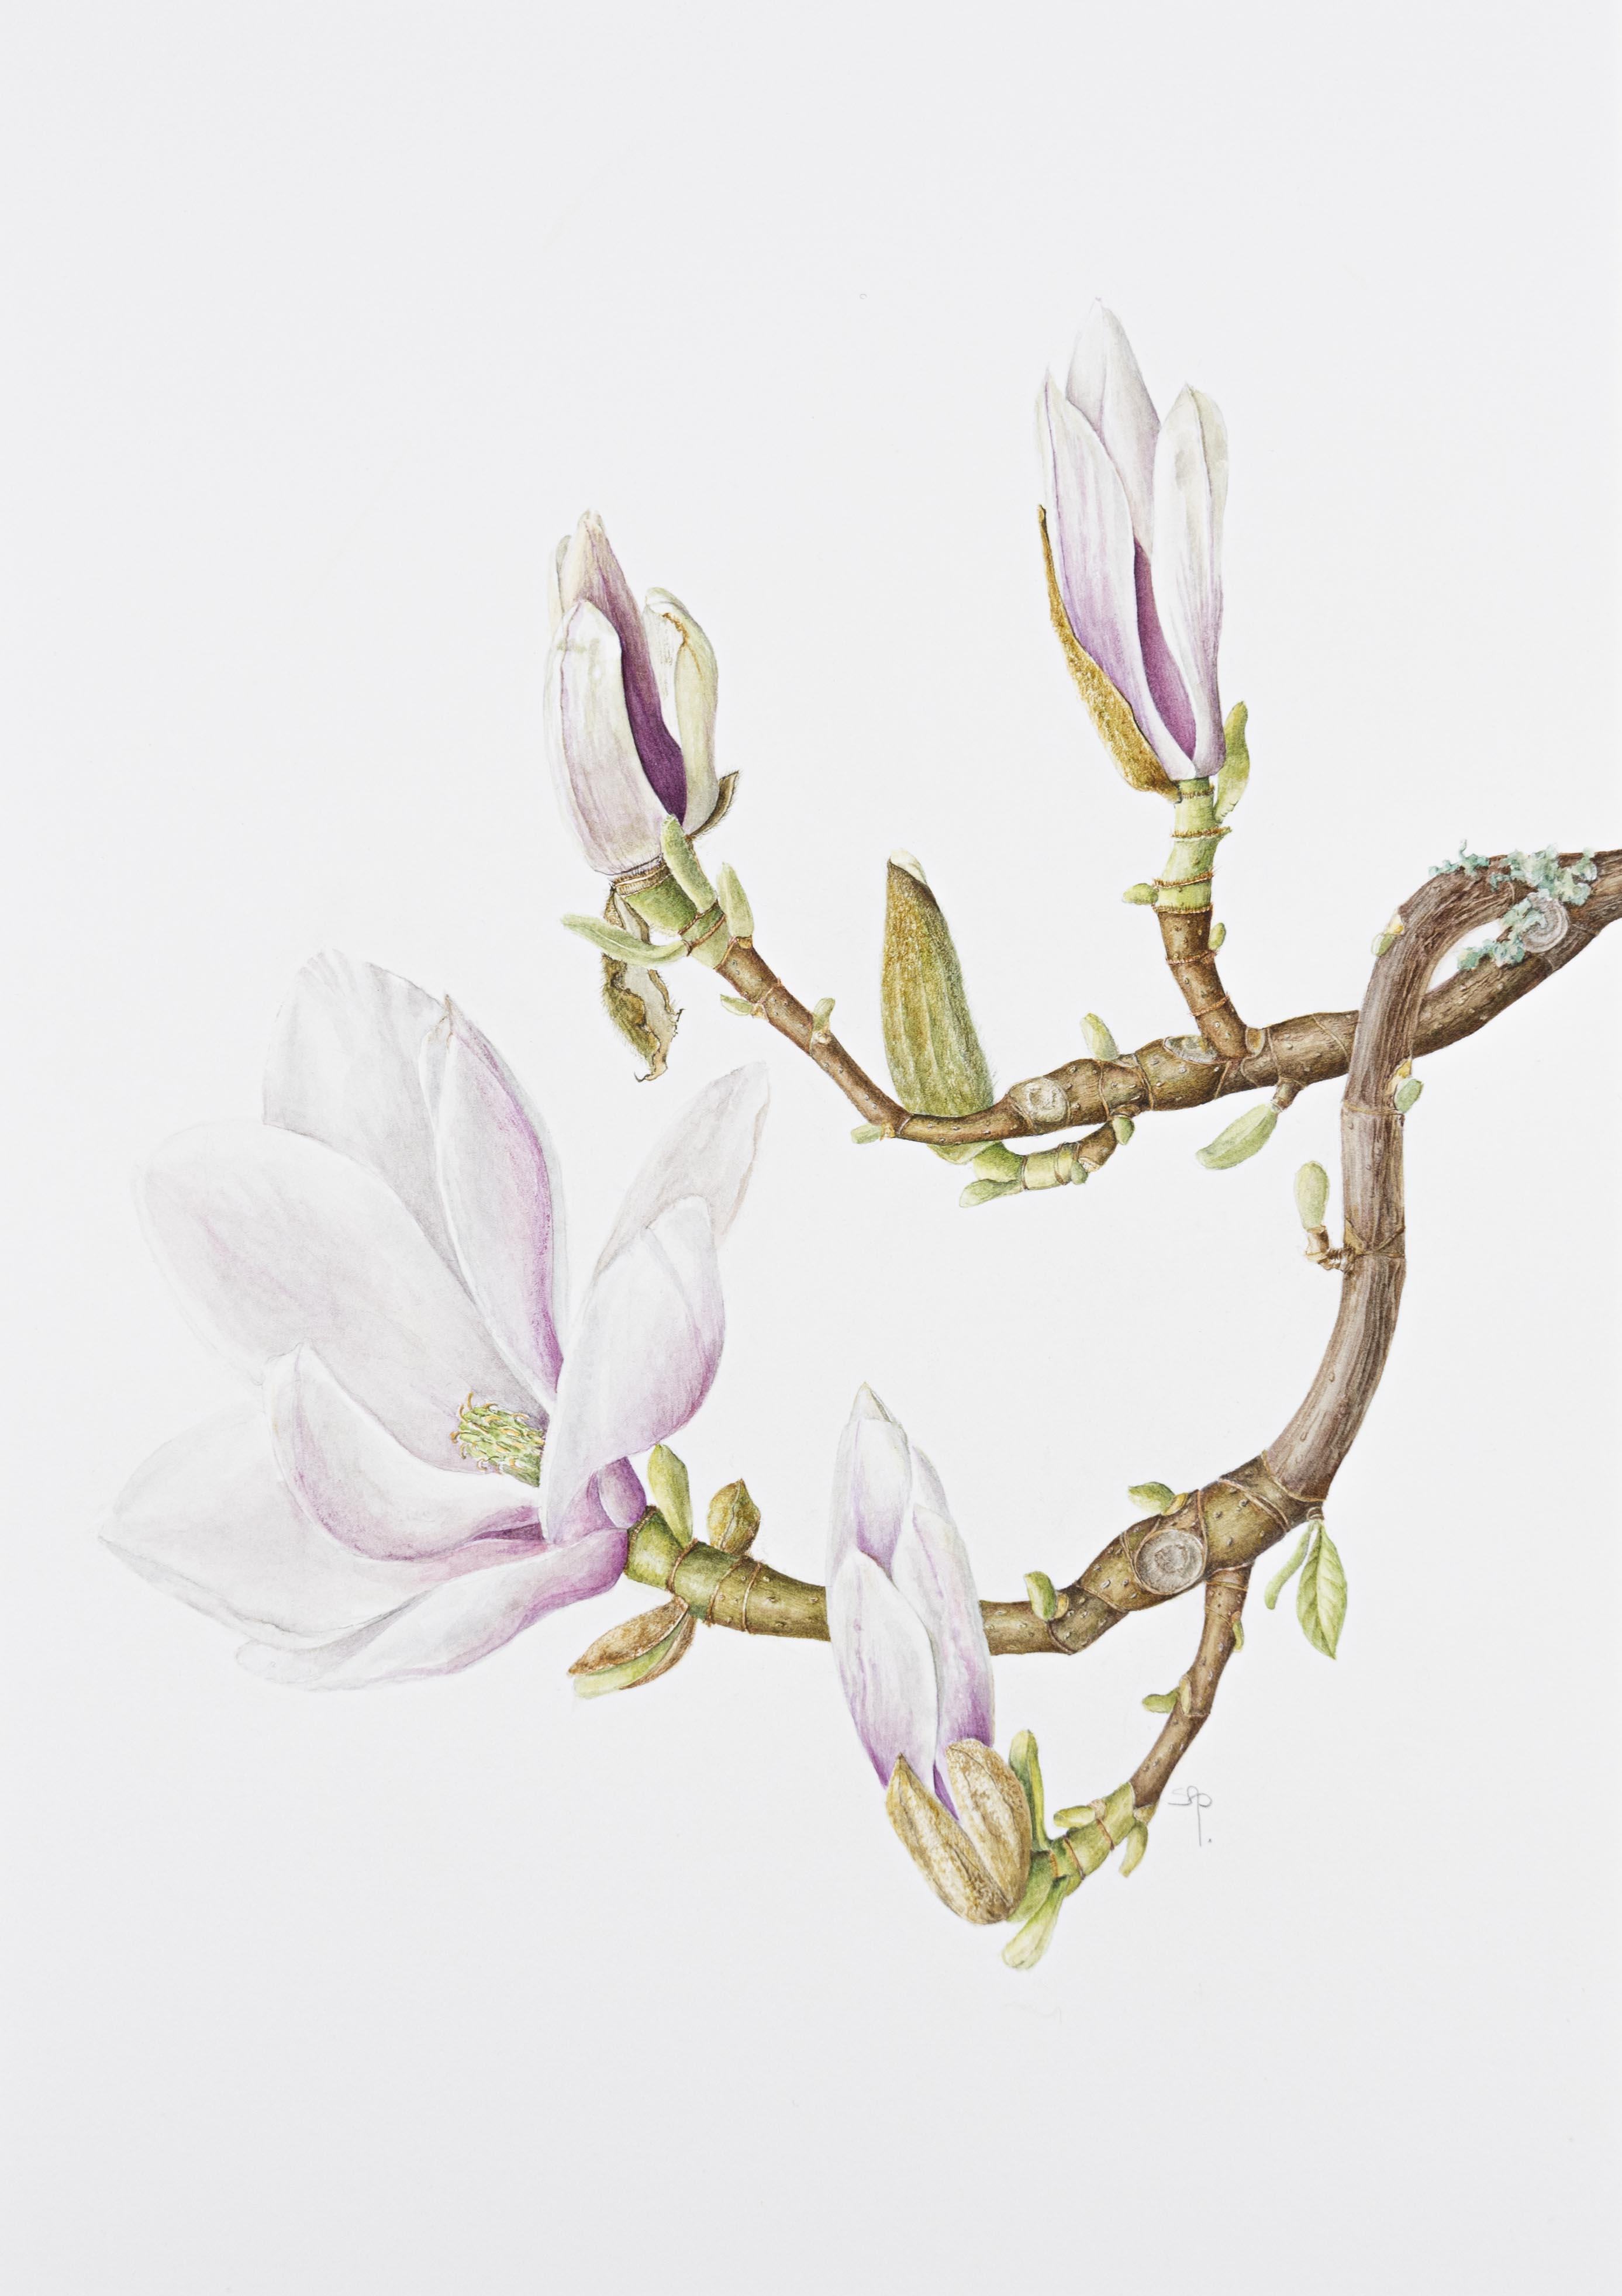 Magnolia x soulangeana